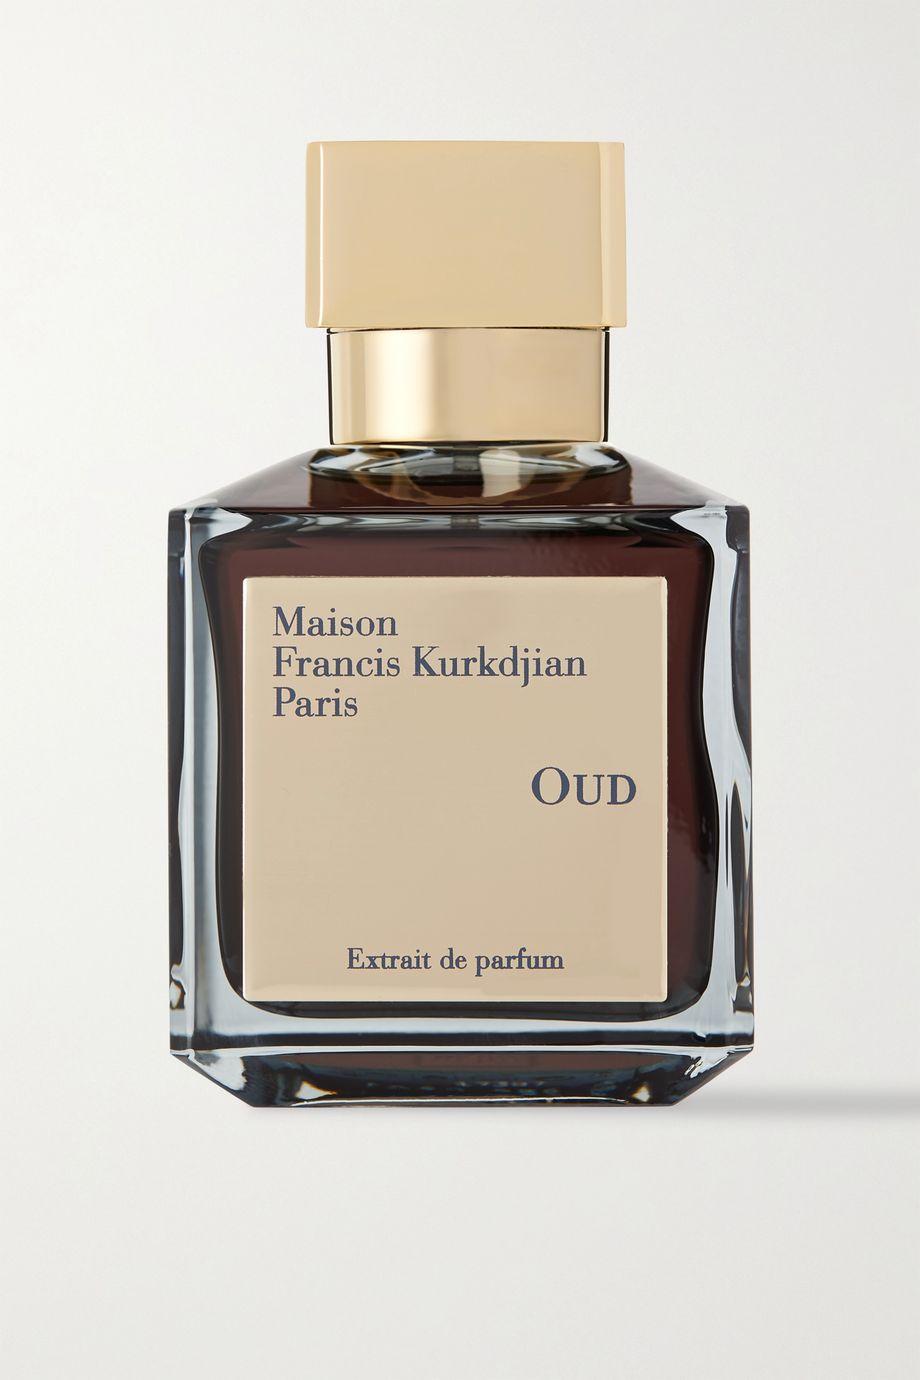 Maison Francis Kurkdjian Extrait de Parfum - Oud, 70ml